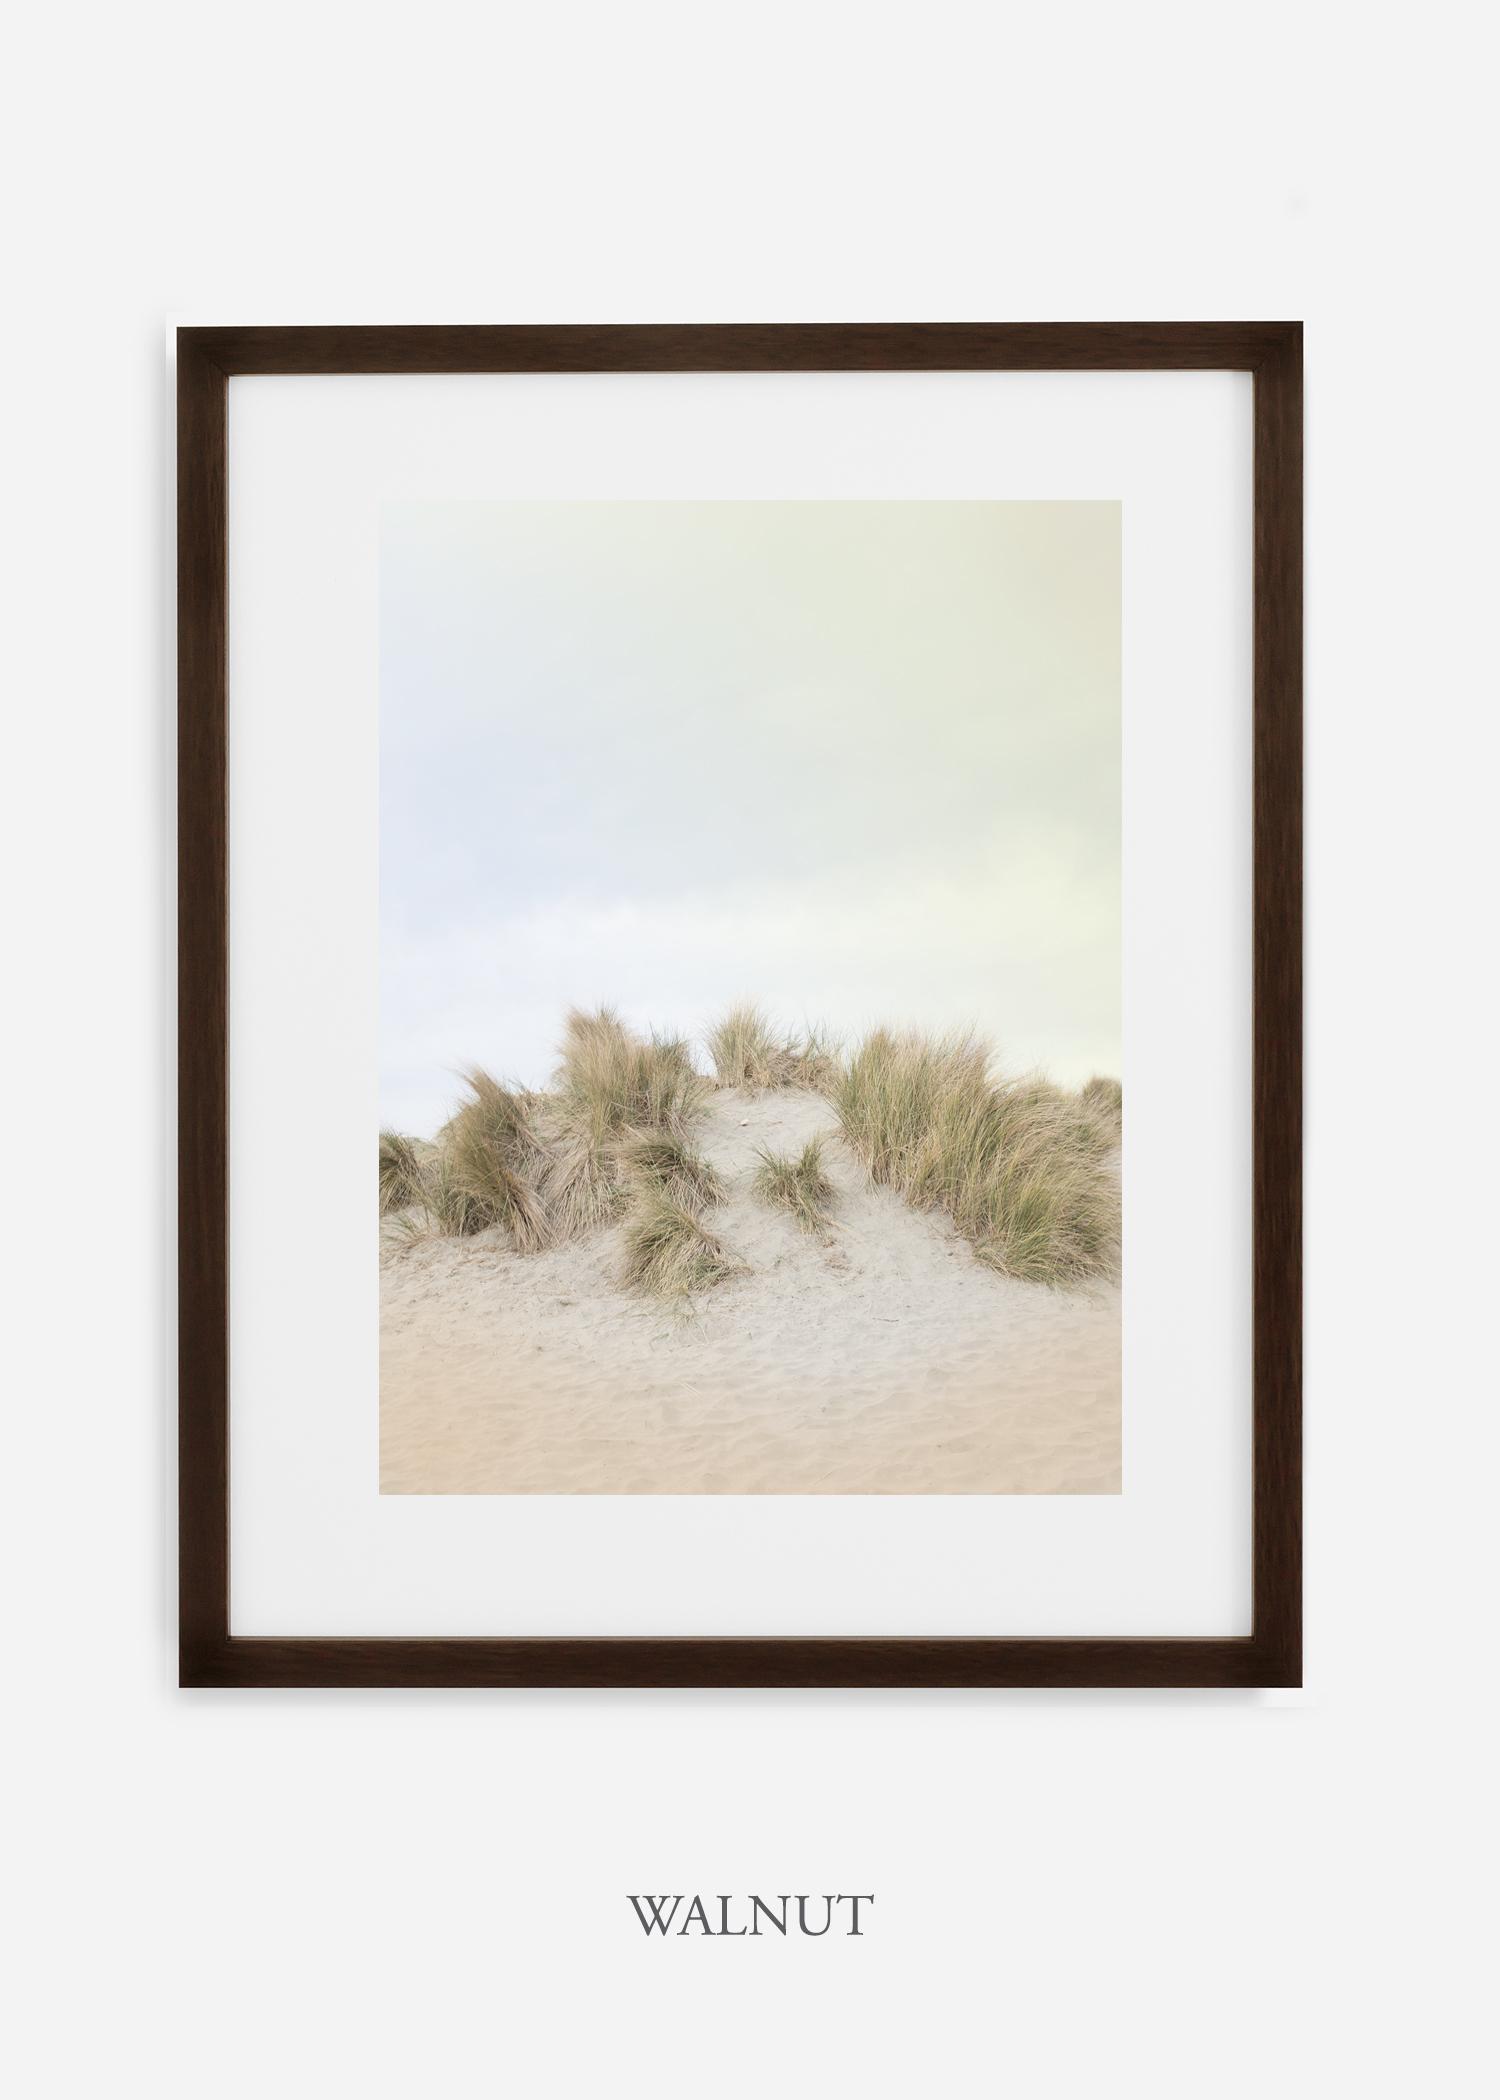 DunesNo.2_walnutframe_BigSur_Ocean_Beach__Art_Photography_interiordesign_bohemian_cactusart.jpg